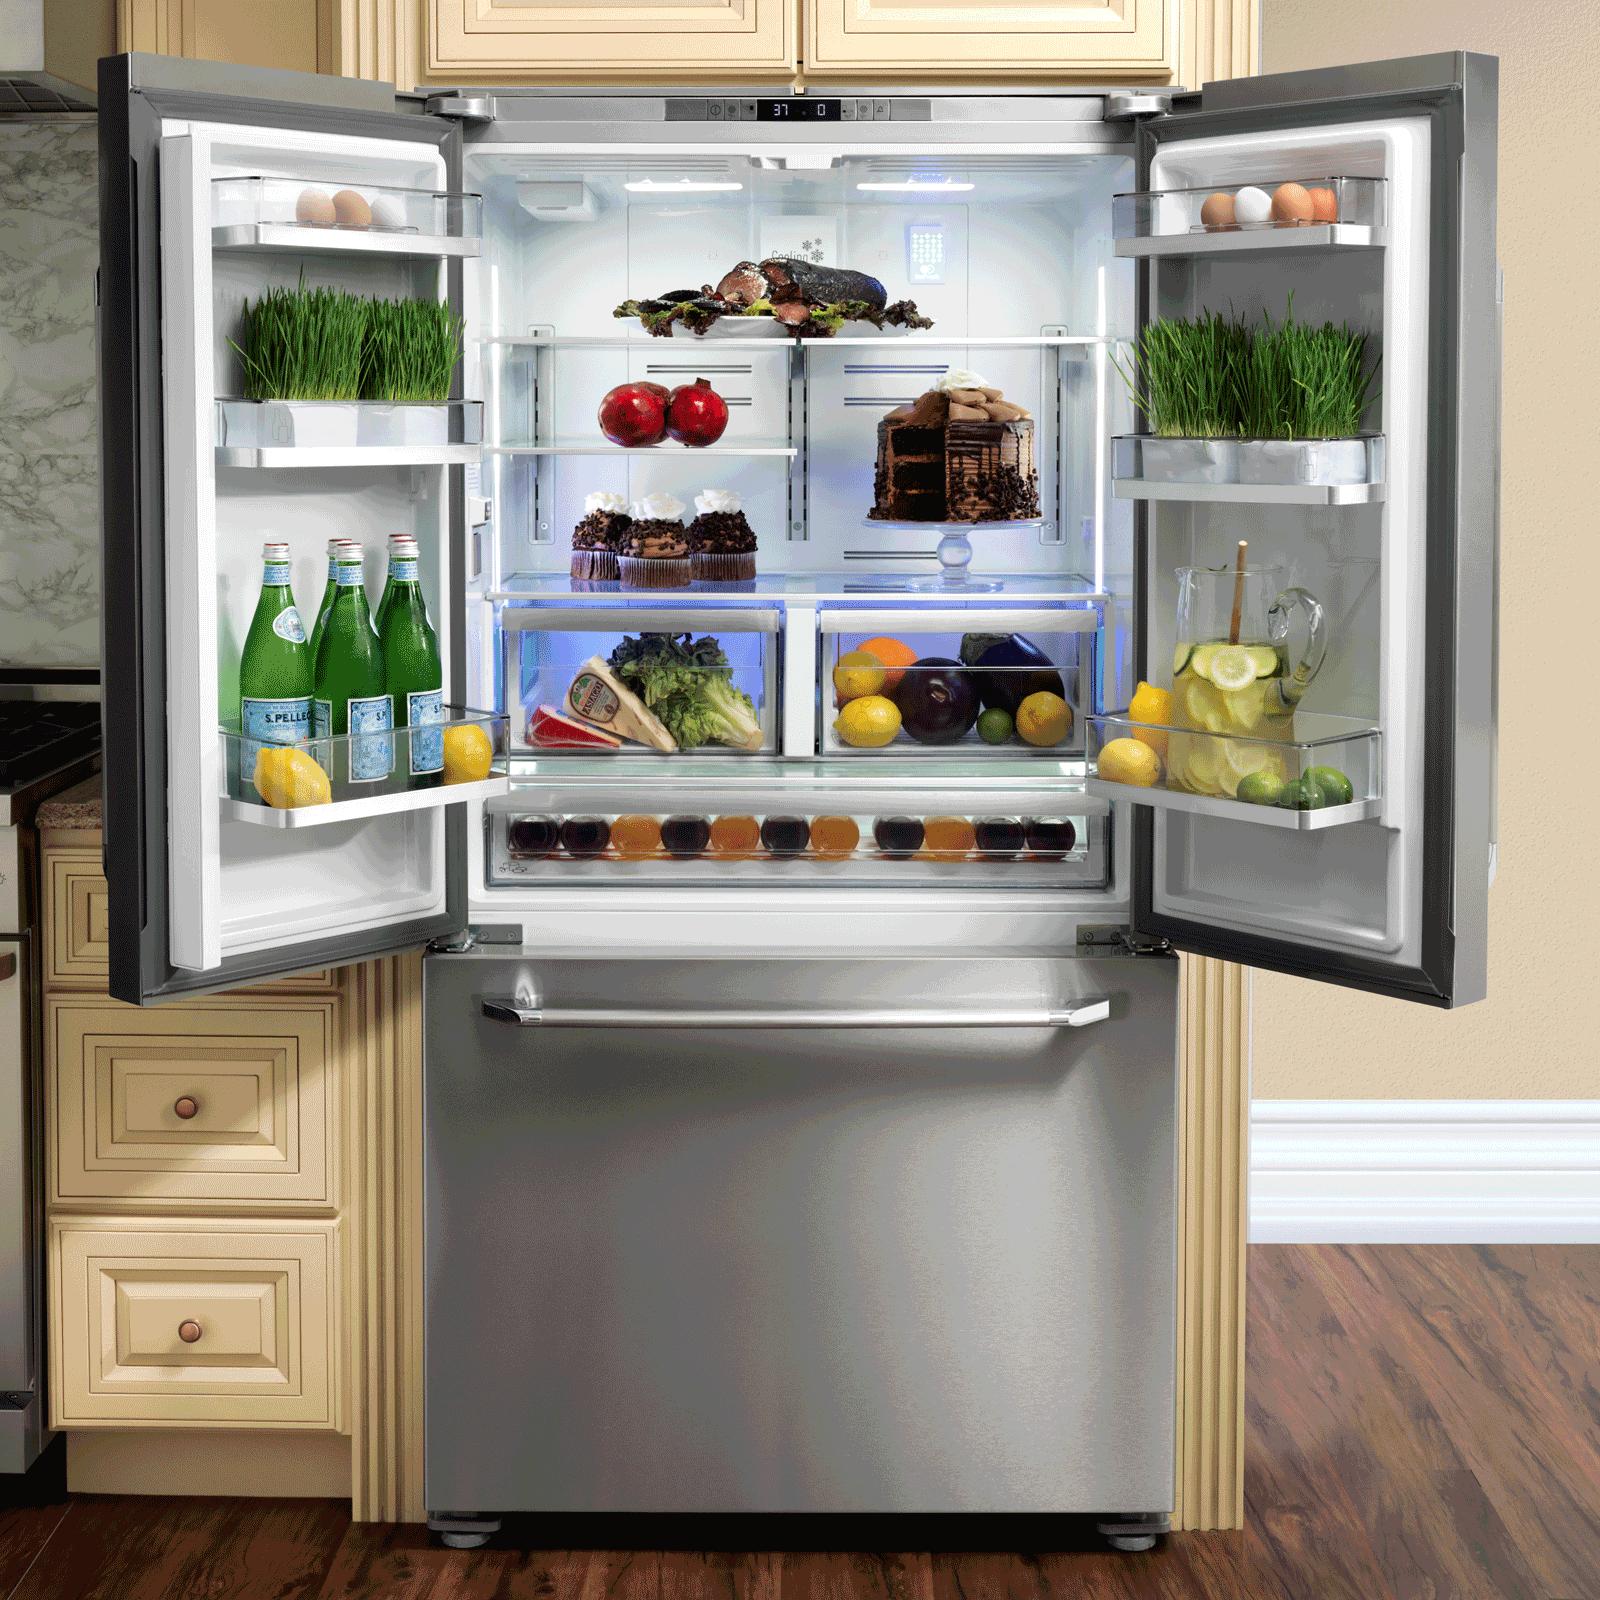 fridgeDTF36FCS_StraightOn_Vignette_1600x1600_150dpi